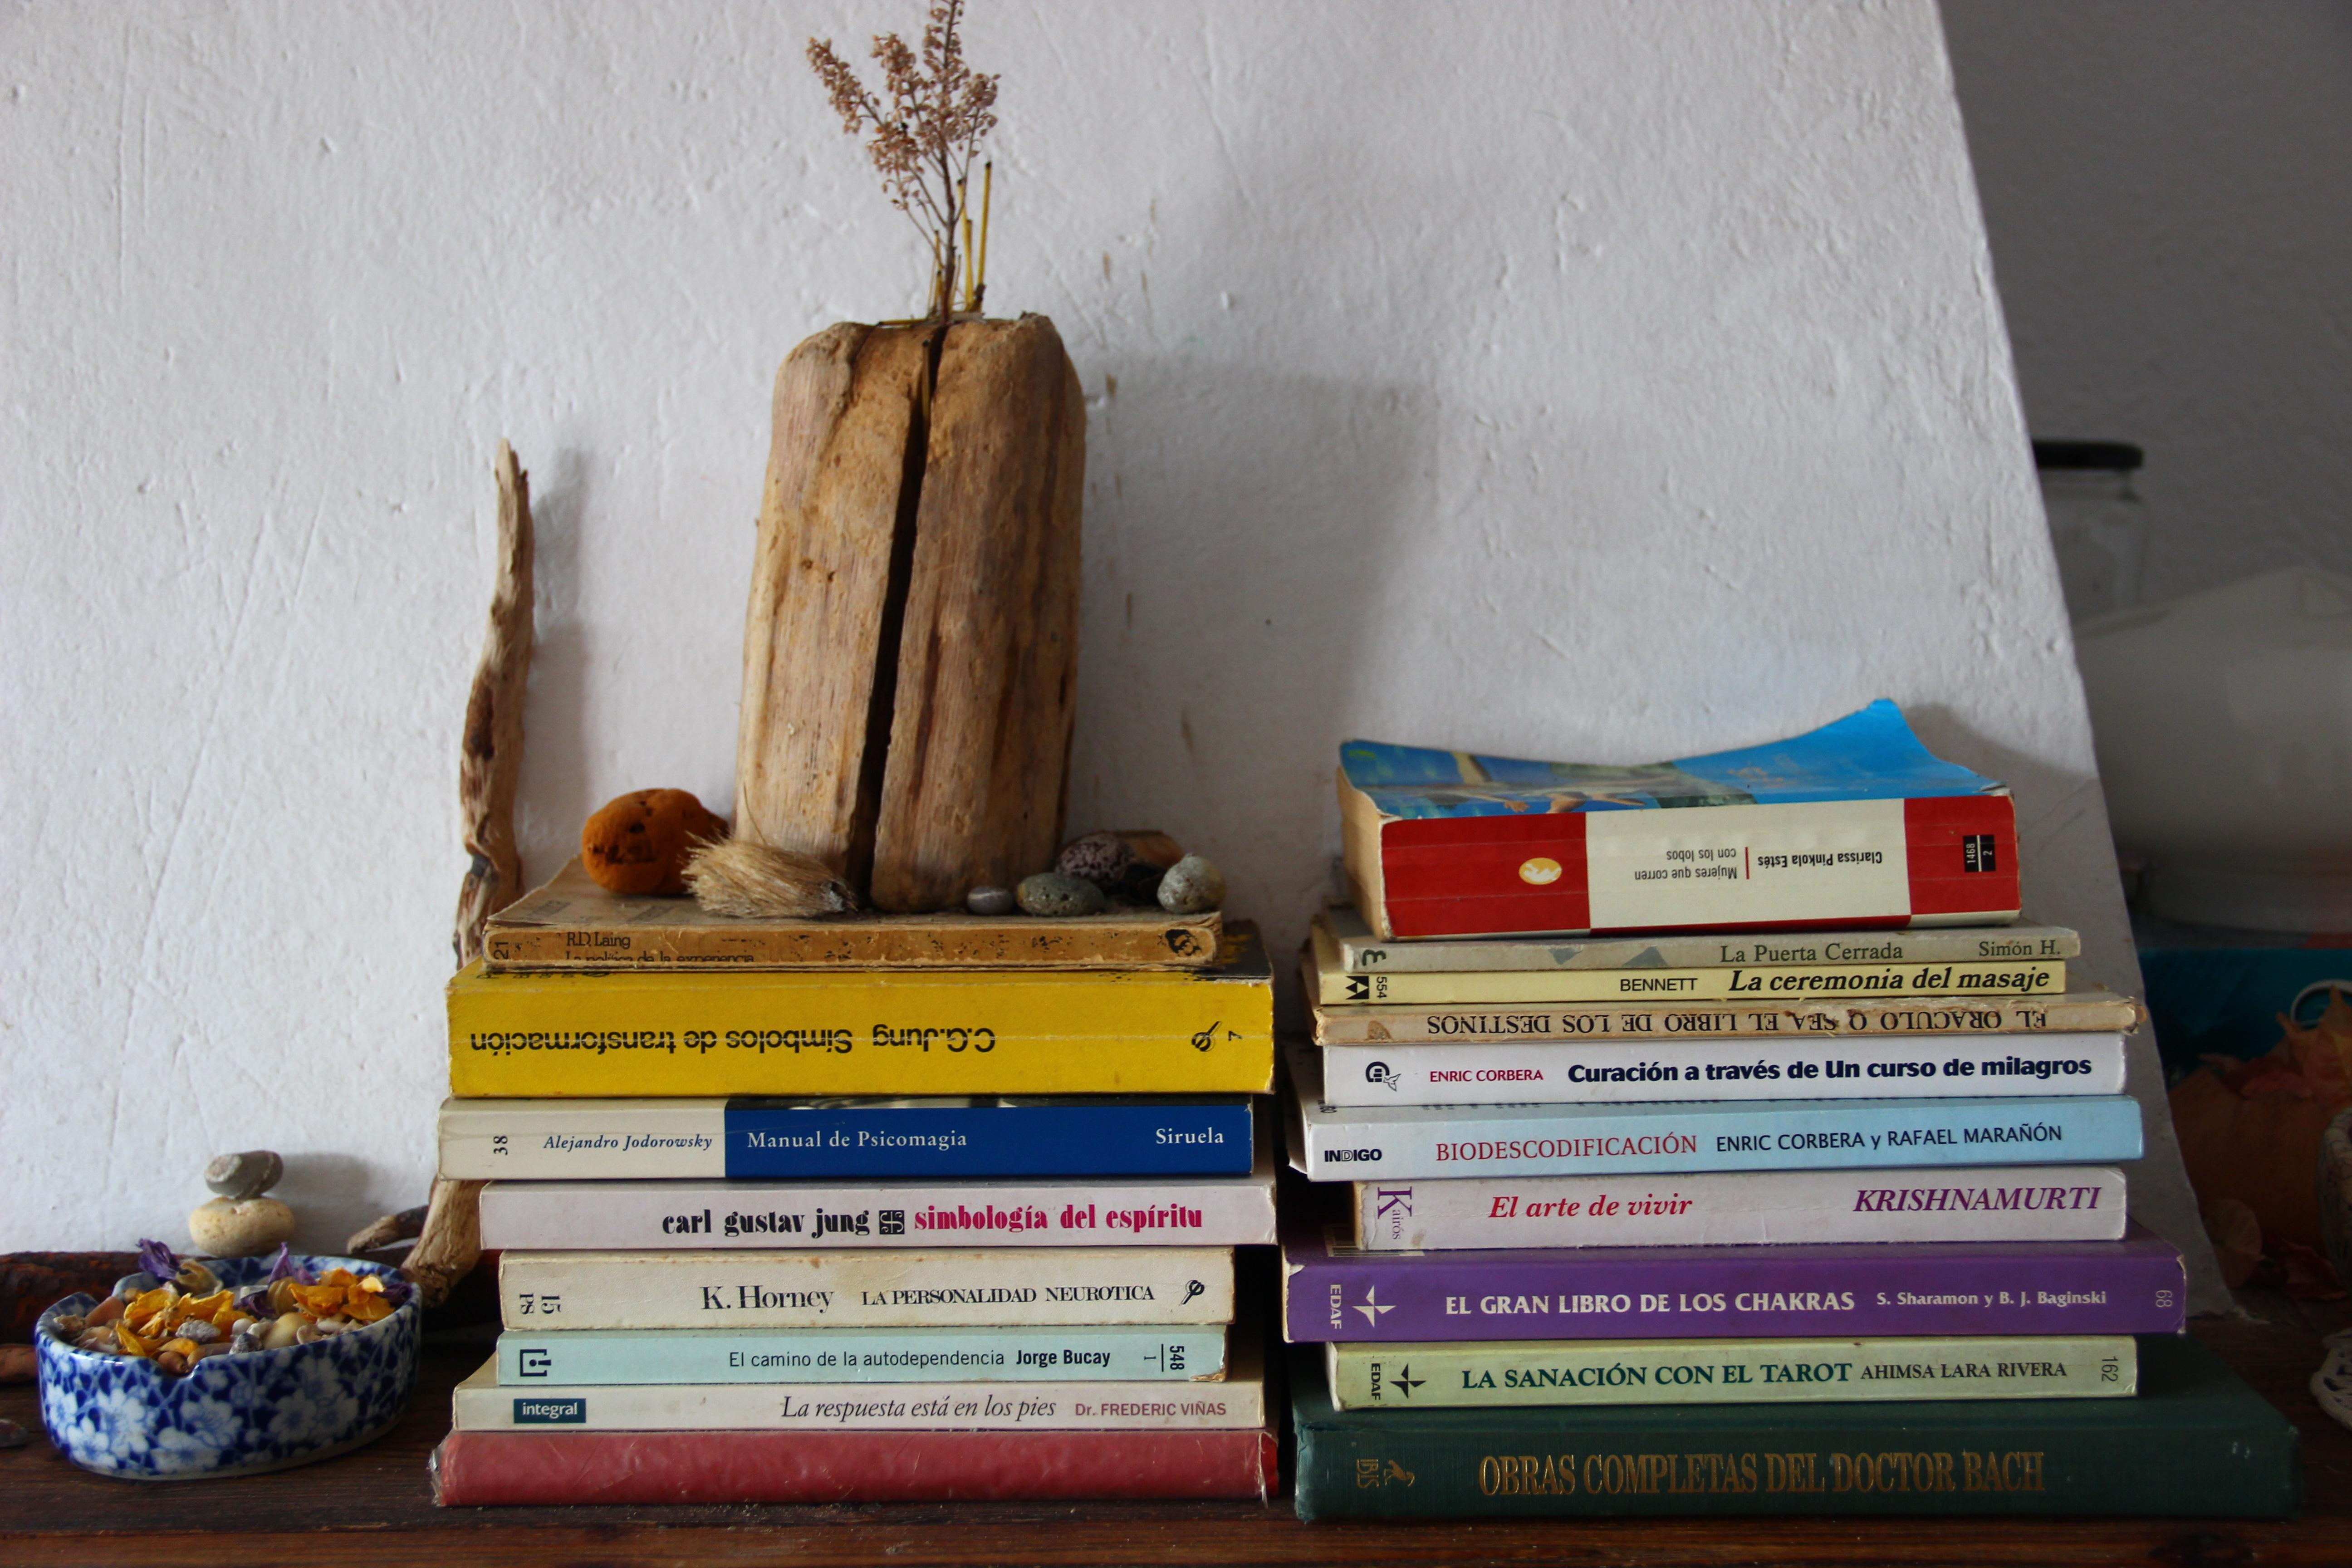 Wood Interior Home Color Bookshelf Book Shelf Meditation Books Psychology  Well Being Stack Of Books Mantelpiece